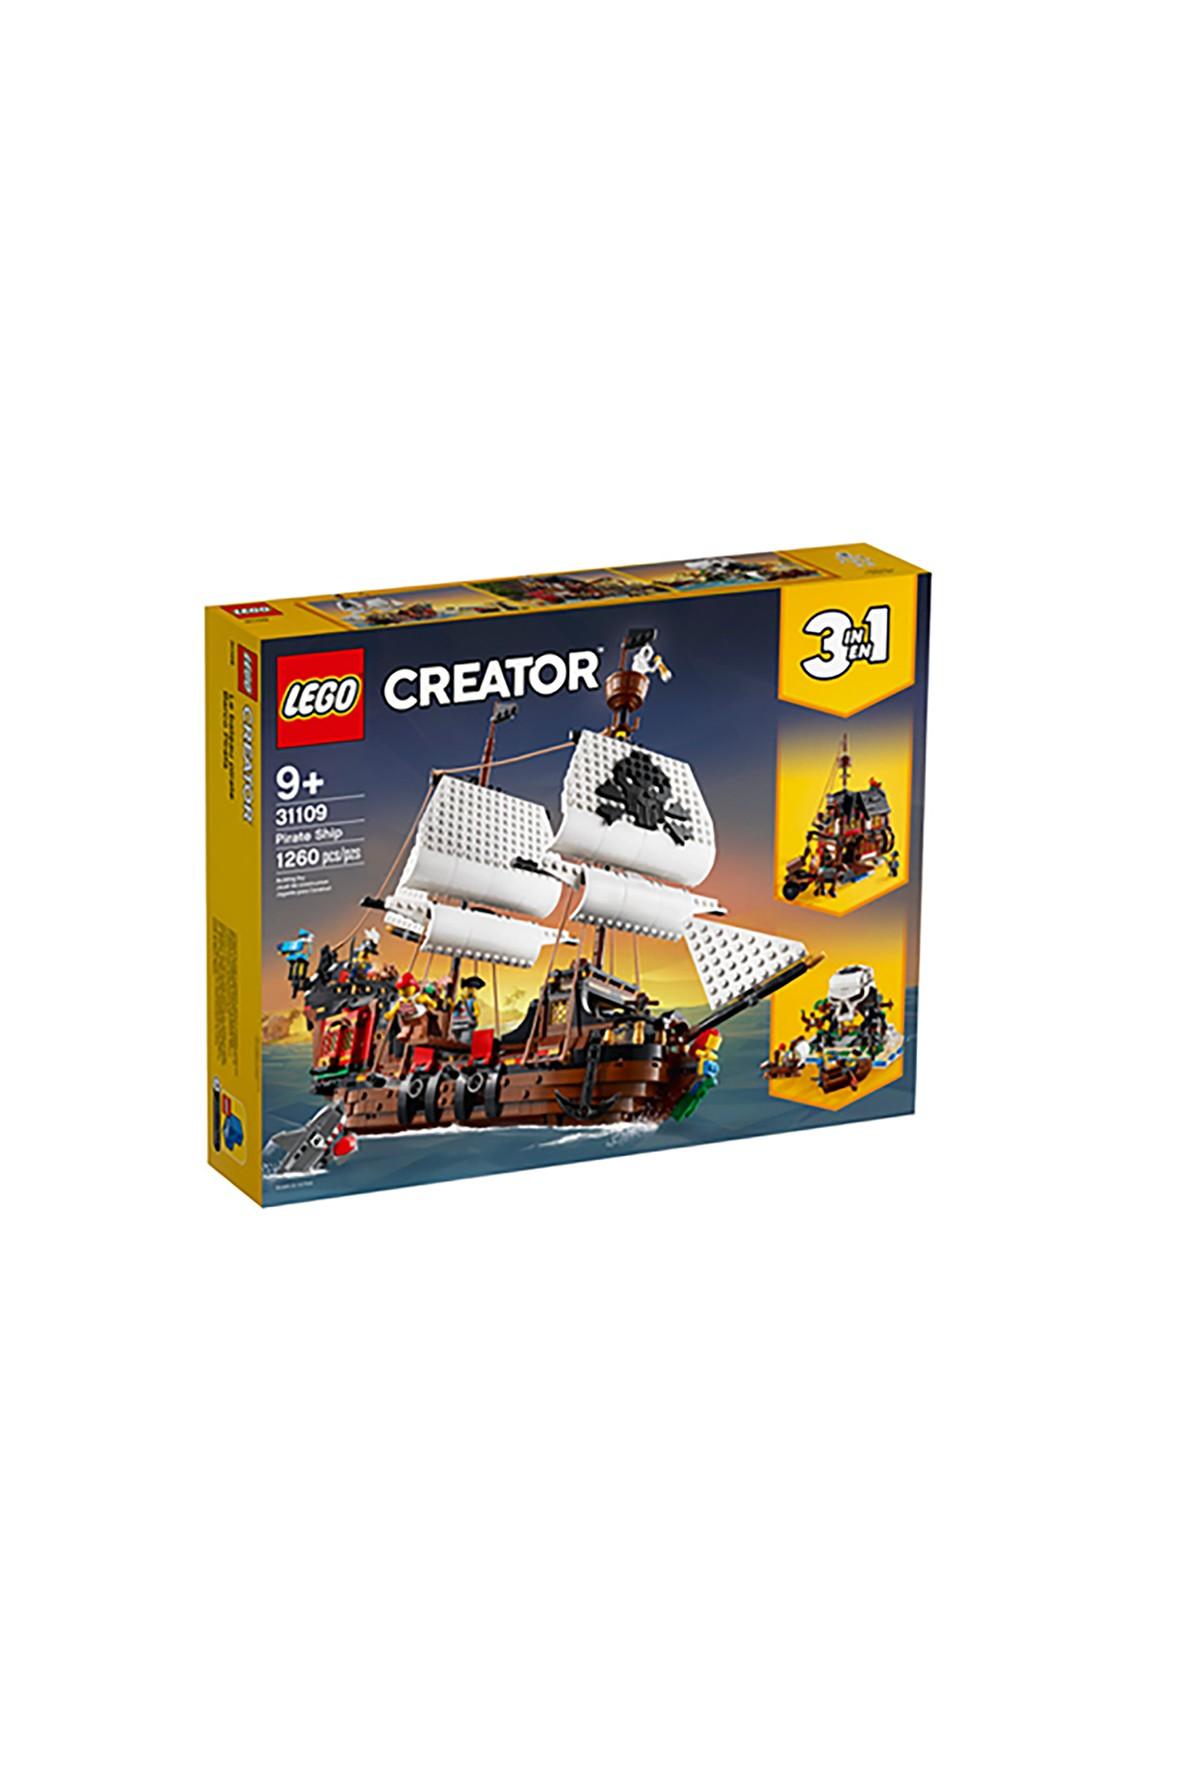 LEGO® Creator 3 w 1 Statek piracki (31109) wiek 9+